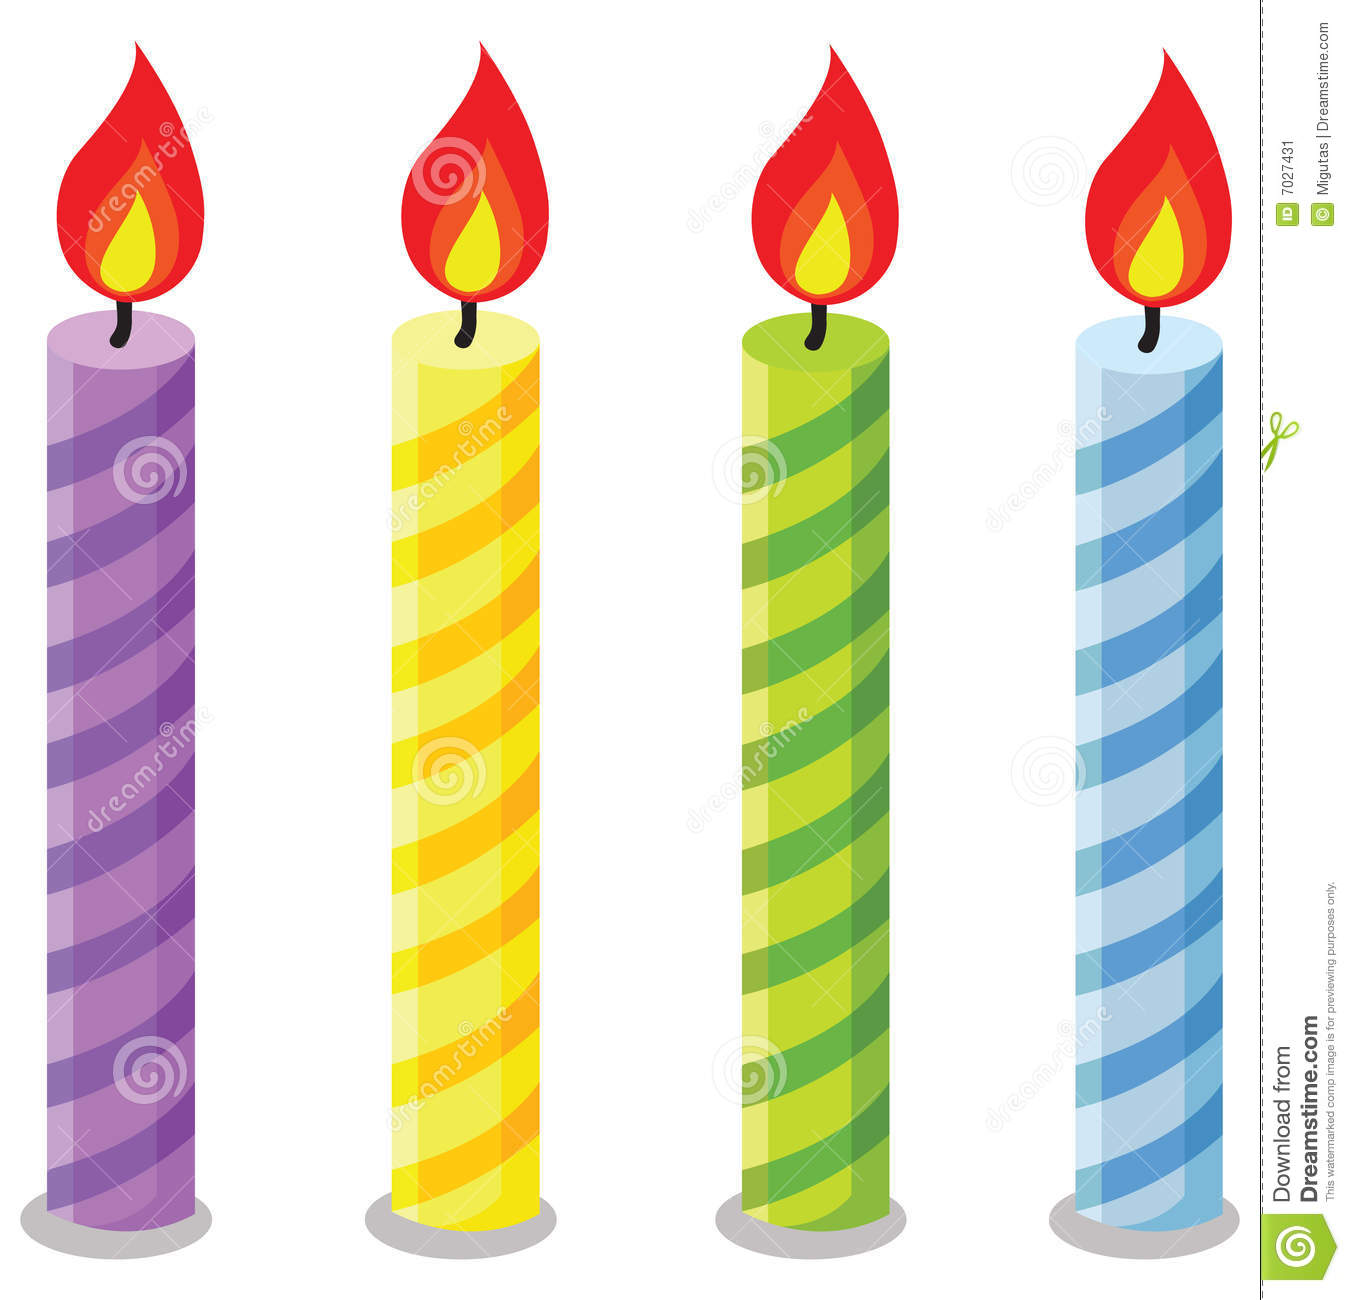 Birthday Candles Stock Image Image 70274-Birthday Candles Stock Image Image 7027431-4